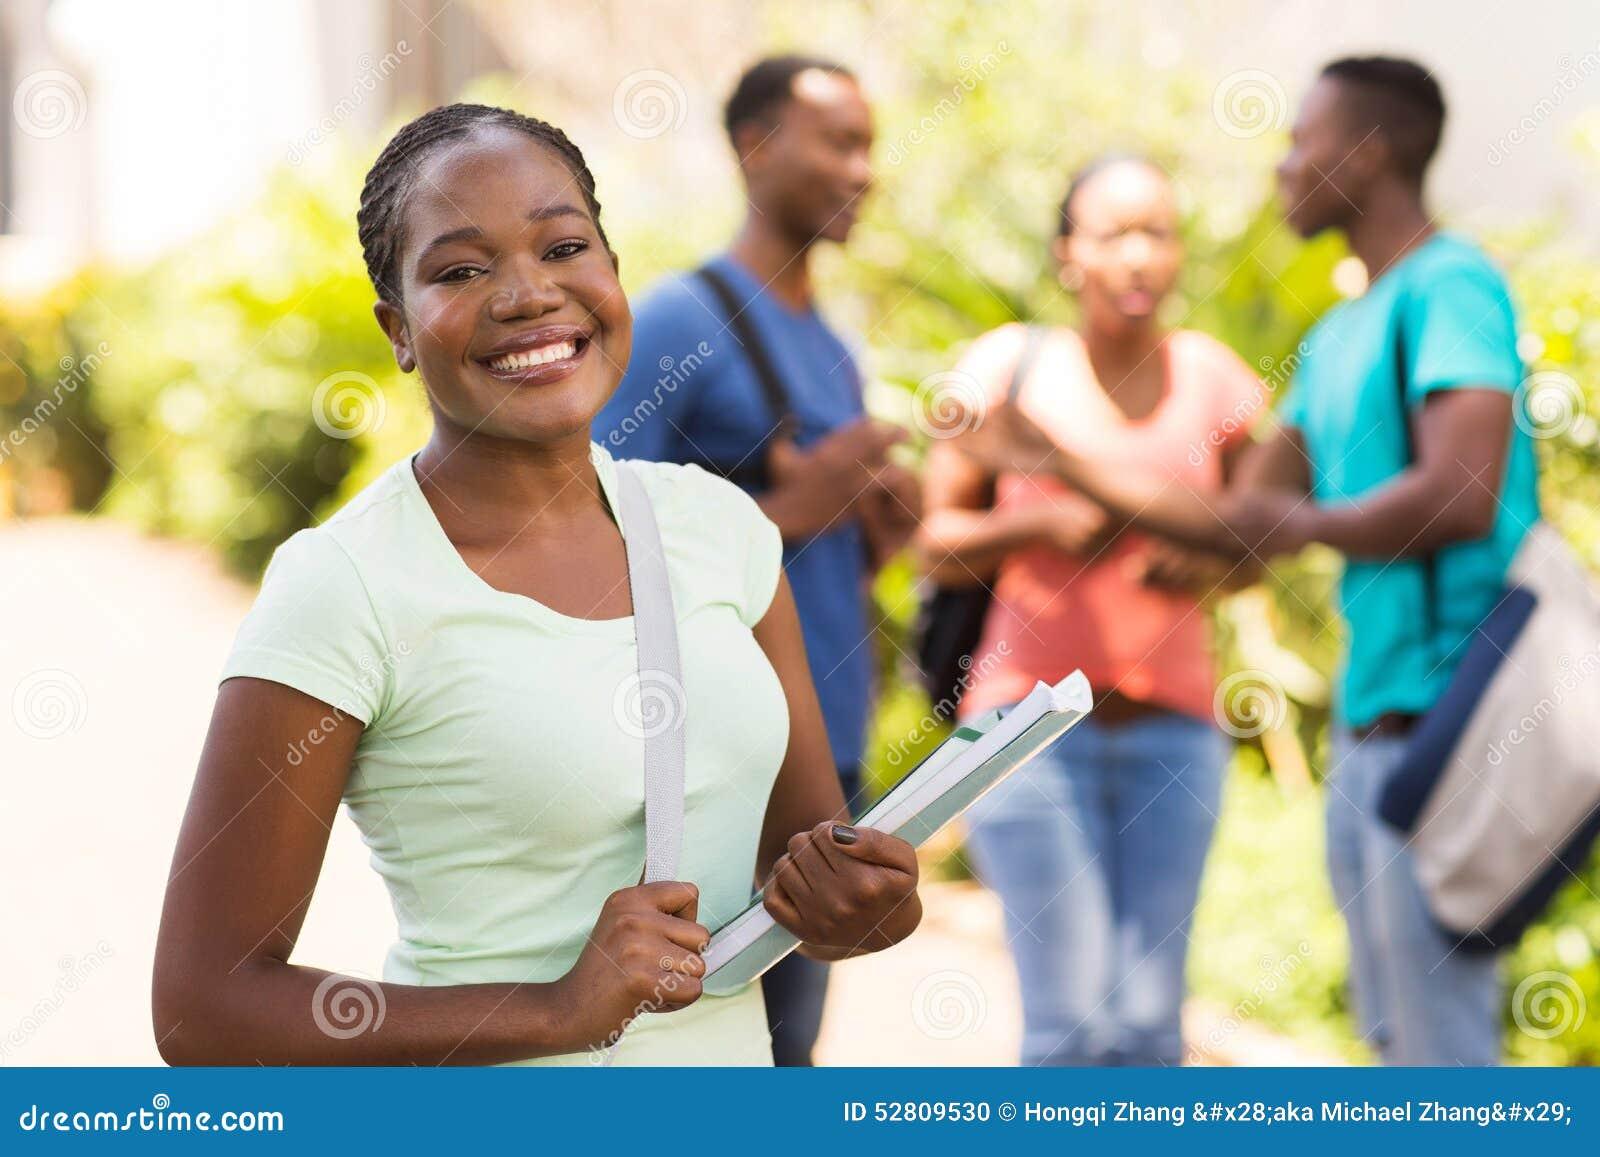 Download Female University Student Campus Stock Photo - Image of lifestyle, ethnicity: 52809530